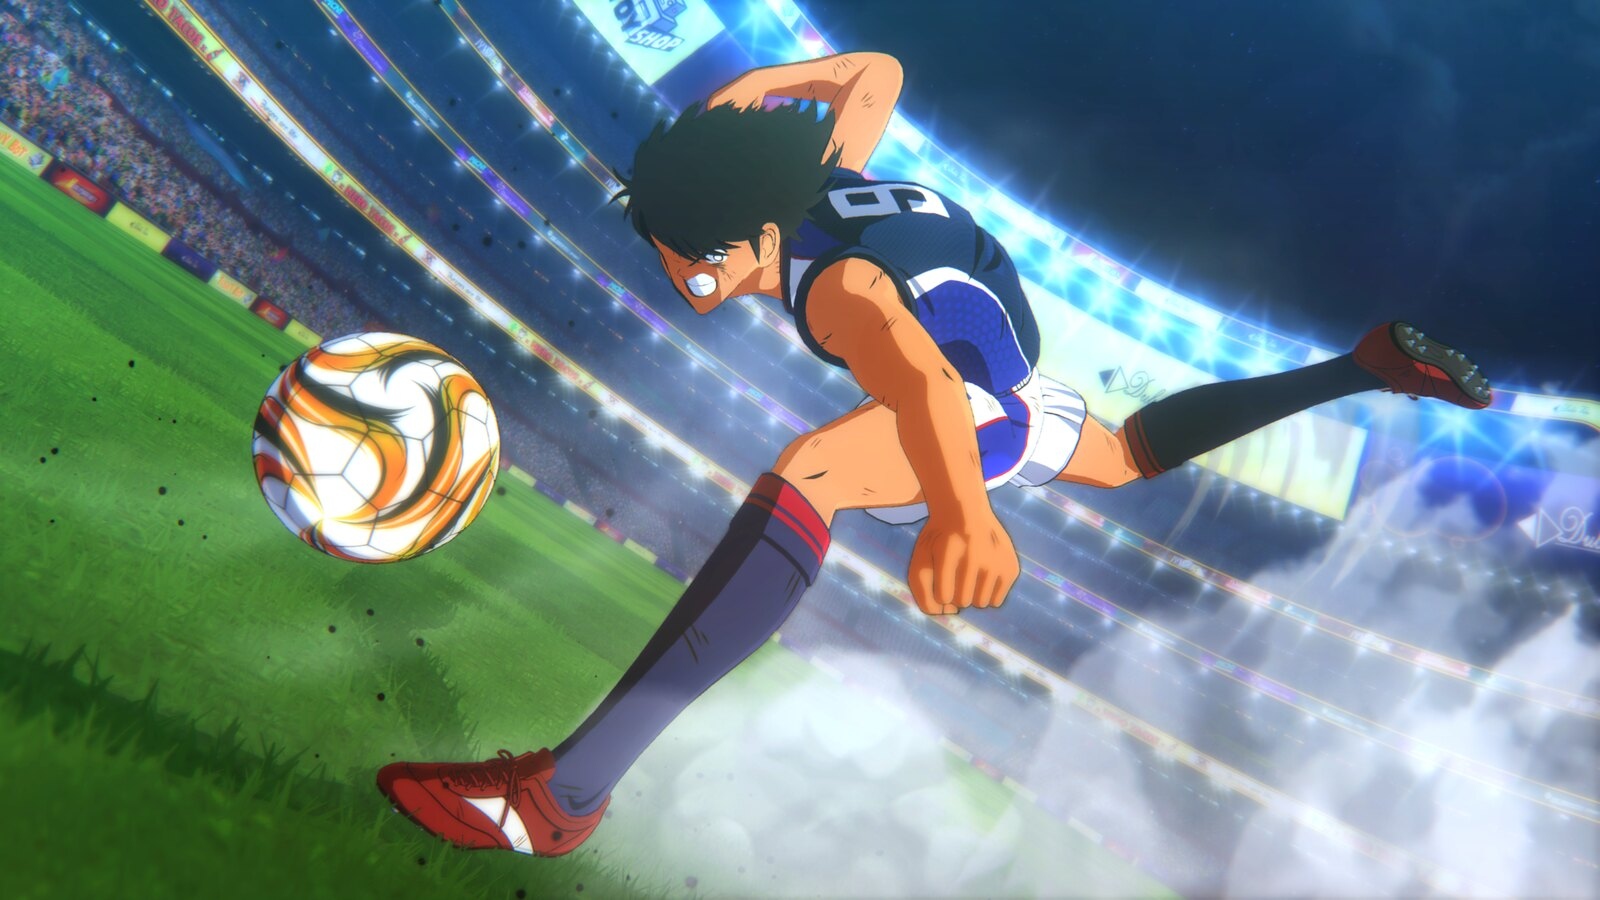 49434194963 fb0e878de2 h - Captain Tsubasa: Rise of new Champions bringt Arcade-Action ins Wohnzimmer